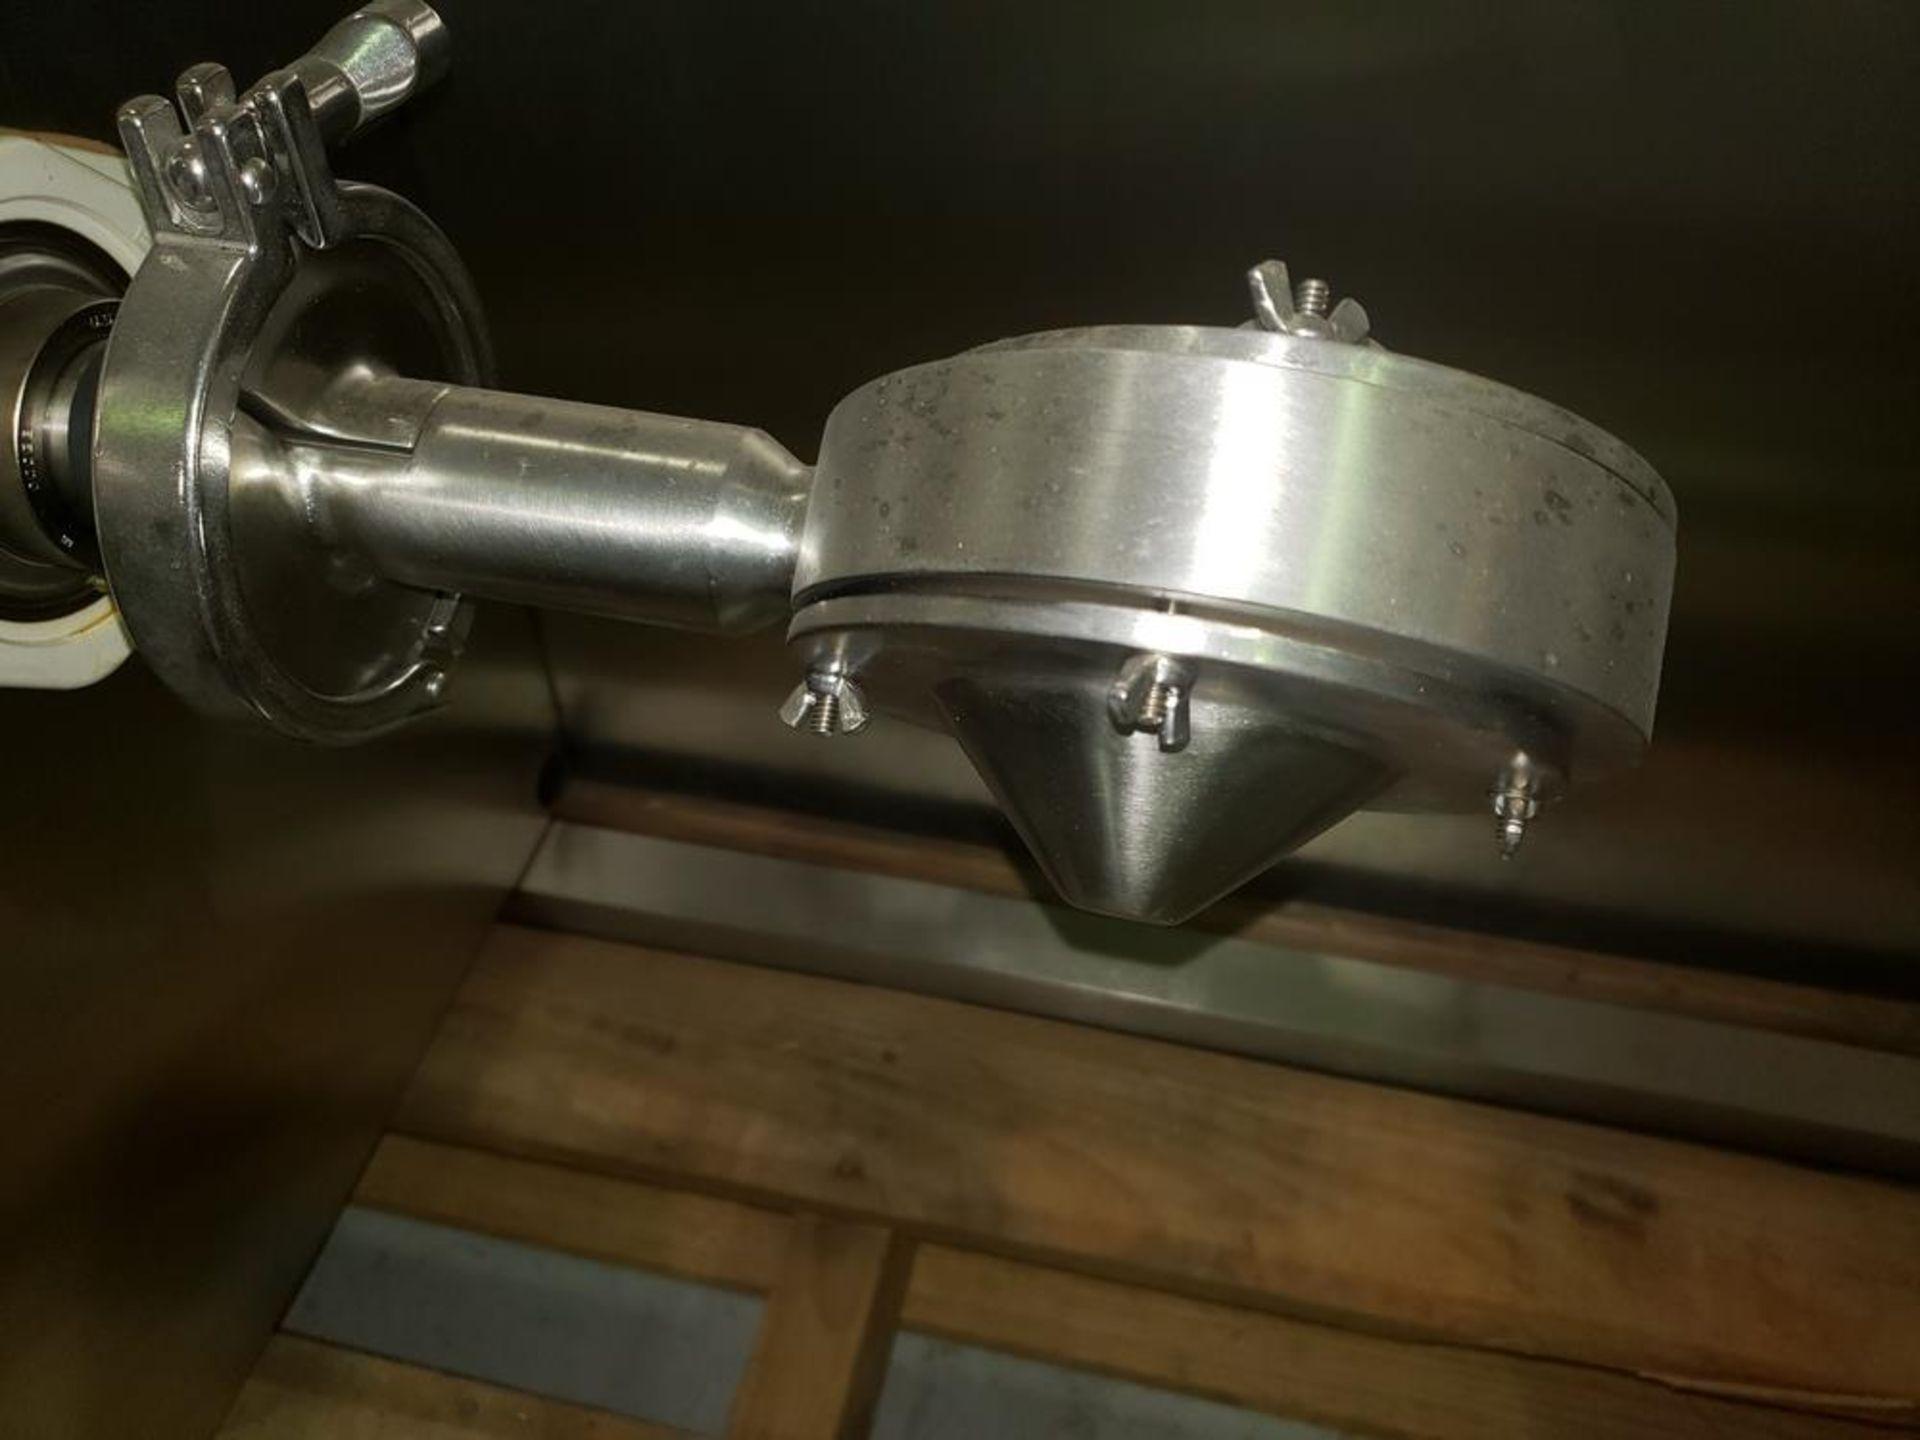 Lot 19 - .5 liter (.017 cu.ft.) Gemco slant cone blender, model GLB, stainless steel construction, bench top